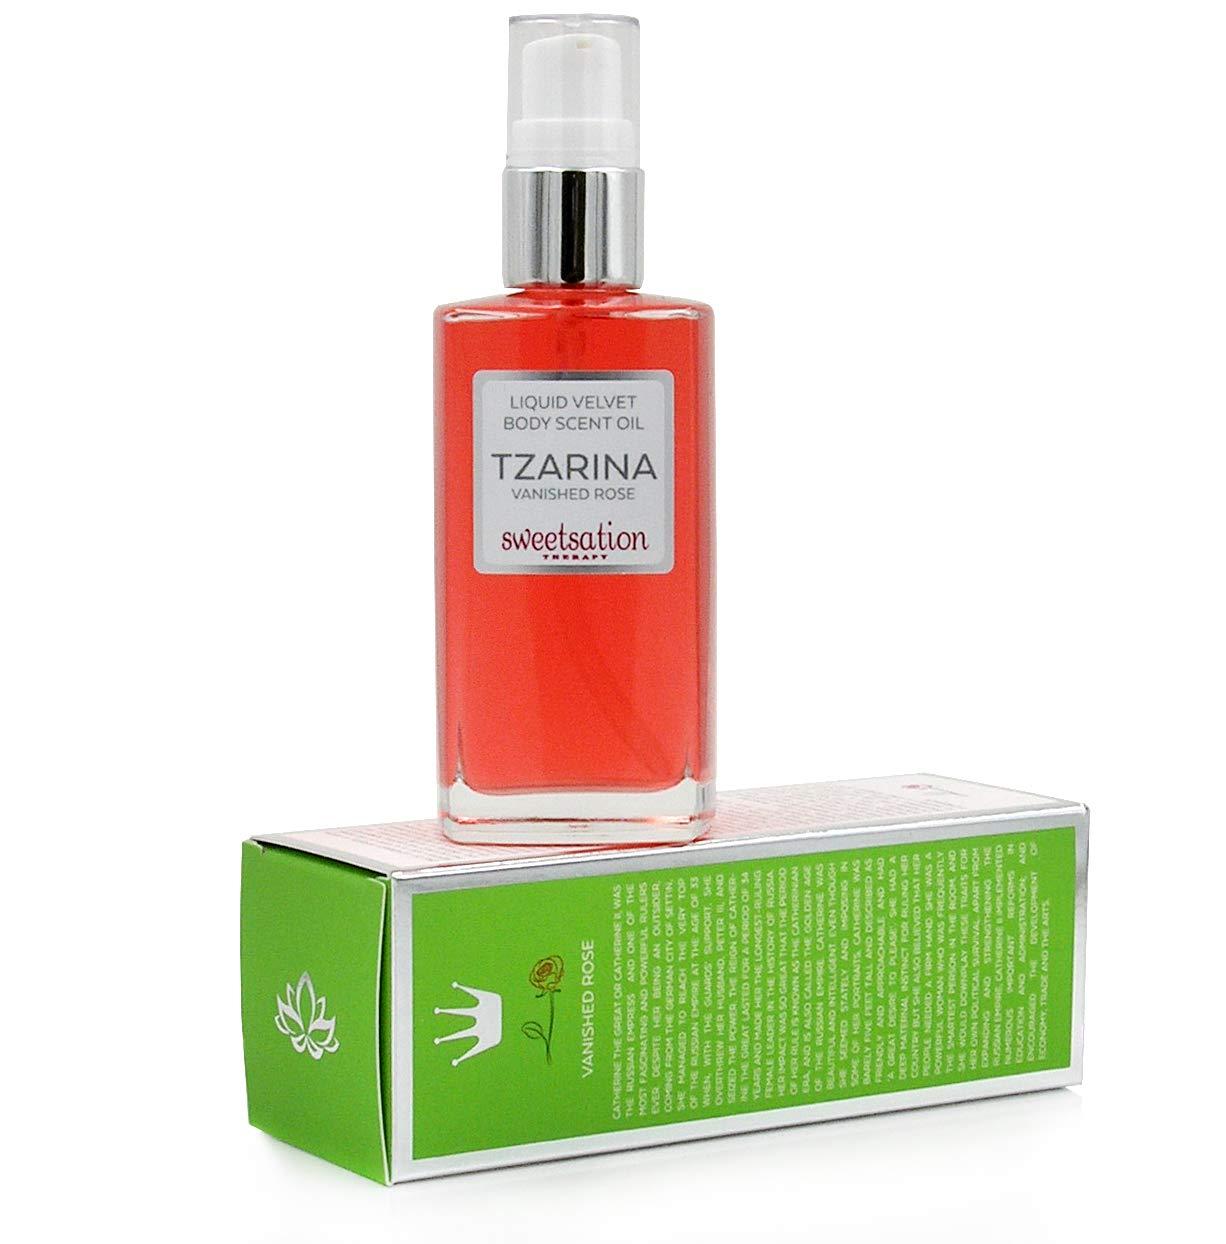 TZARINA Liquid Velvet Body Scent Oil, Vanished Rose, 3.3oz. 100 Natural 46 Organic.